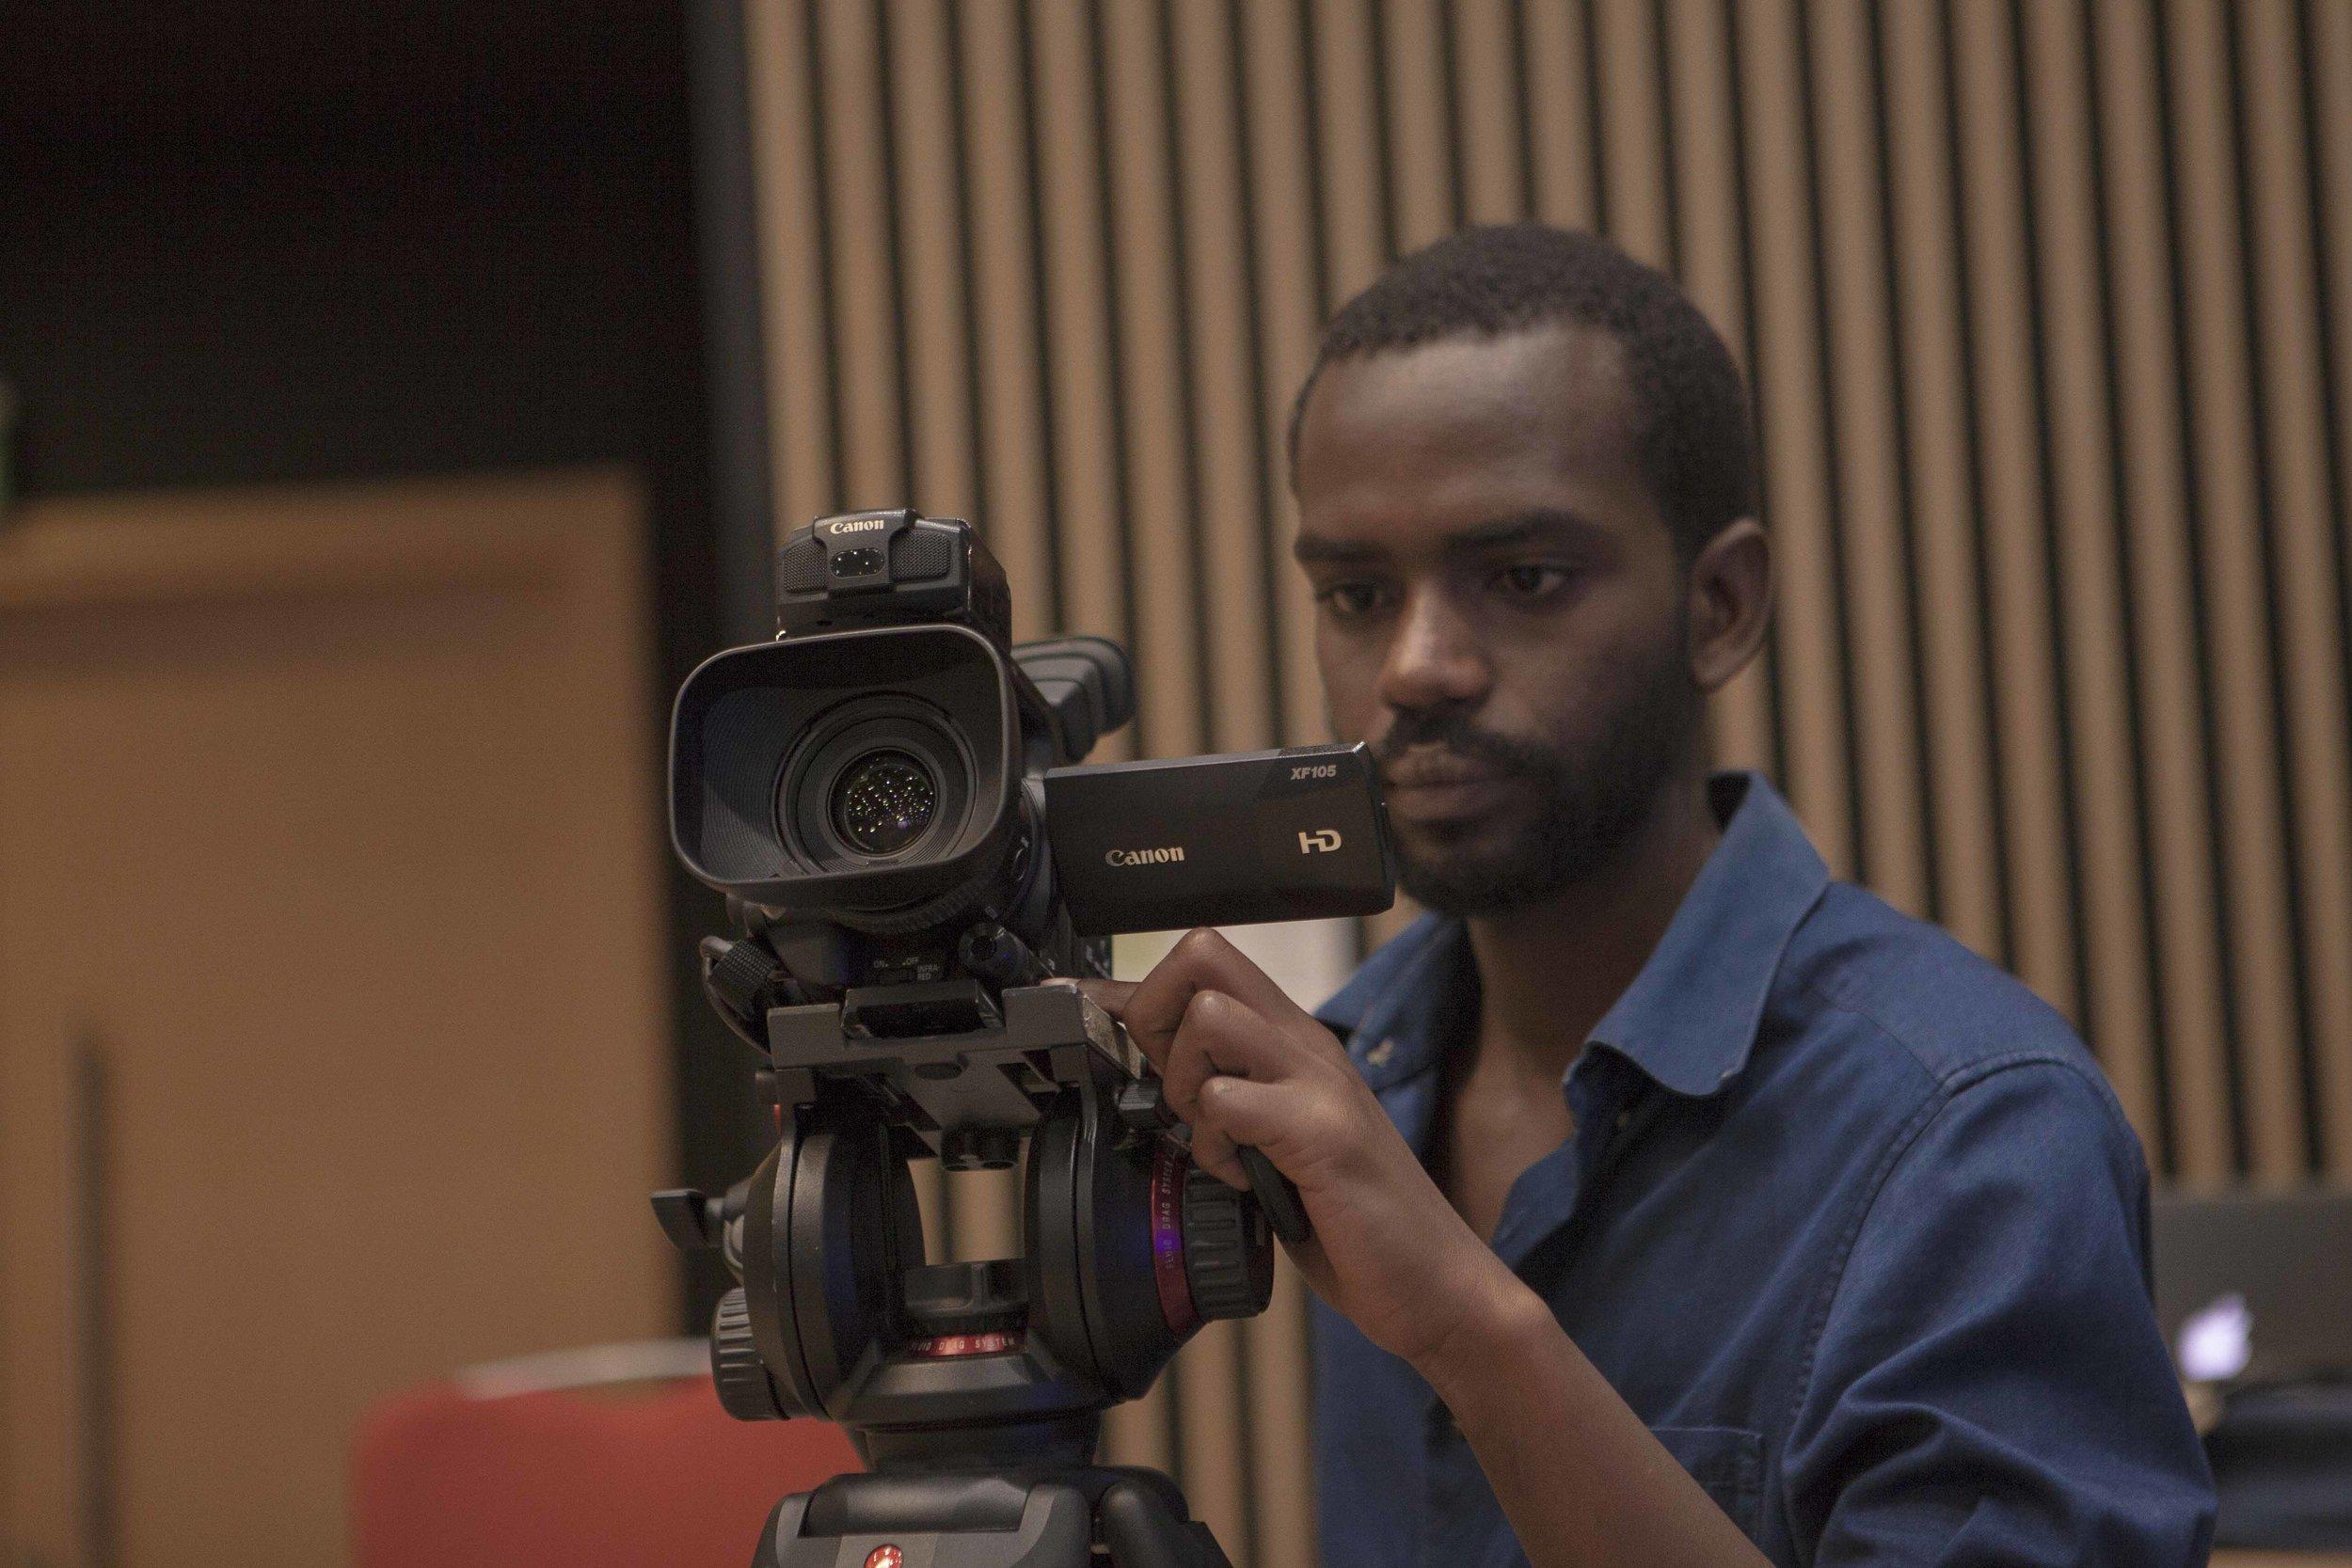 David, one of ADMA students setting up the camera